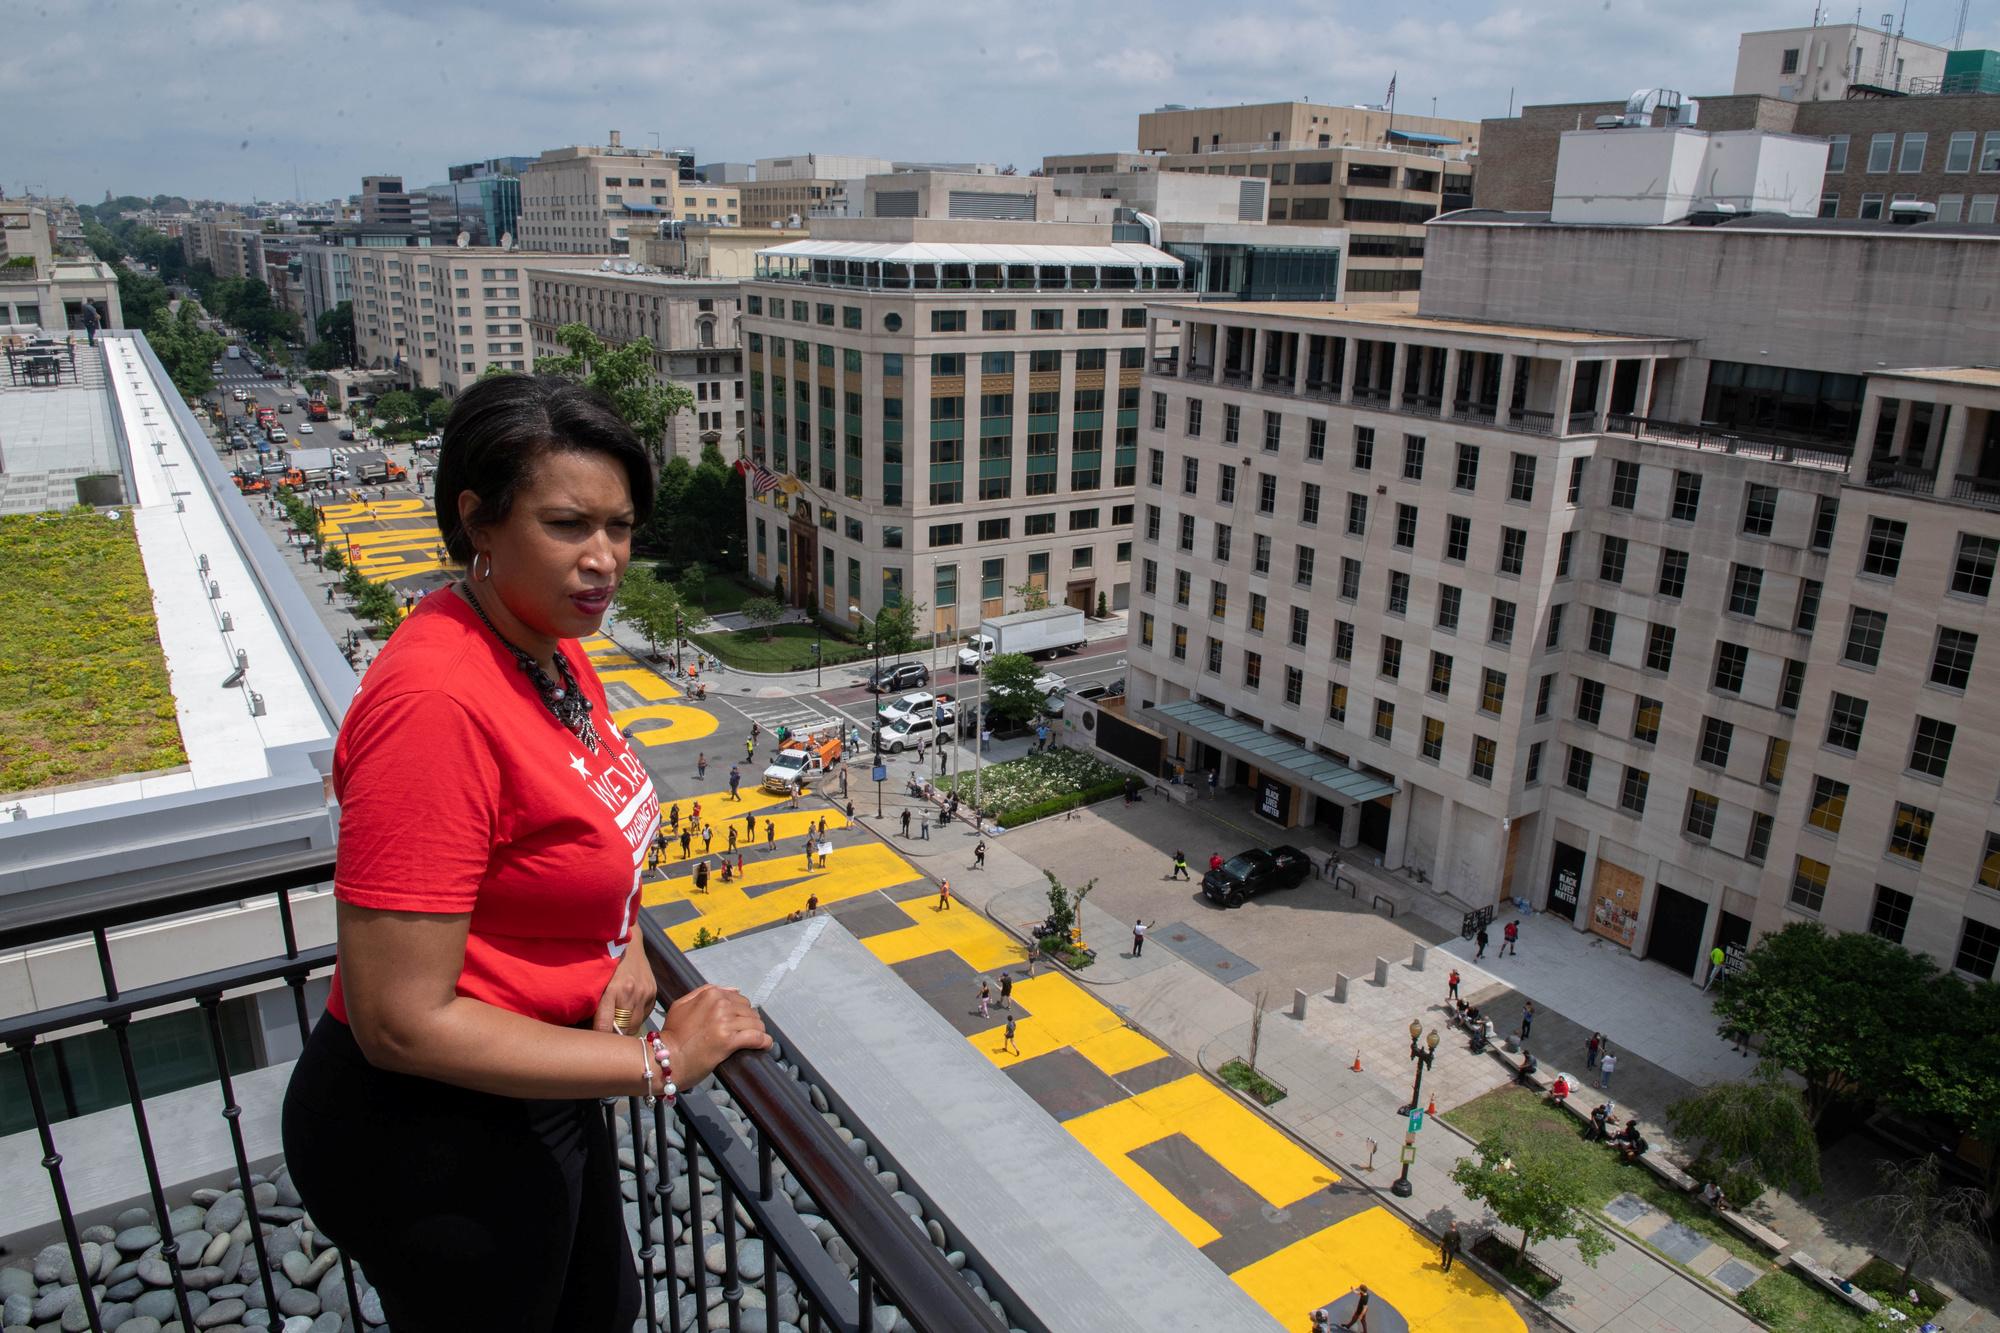 Muriel Bowser, maire de Washington D.C., Khalid Naji-Allah Executive Office of the Mayor/Handout via REUTERS